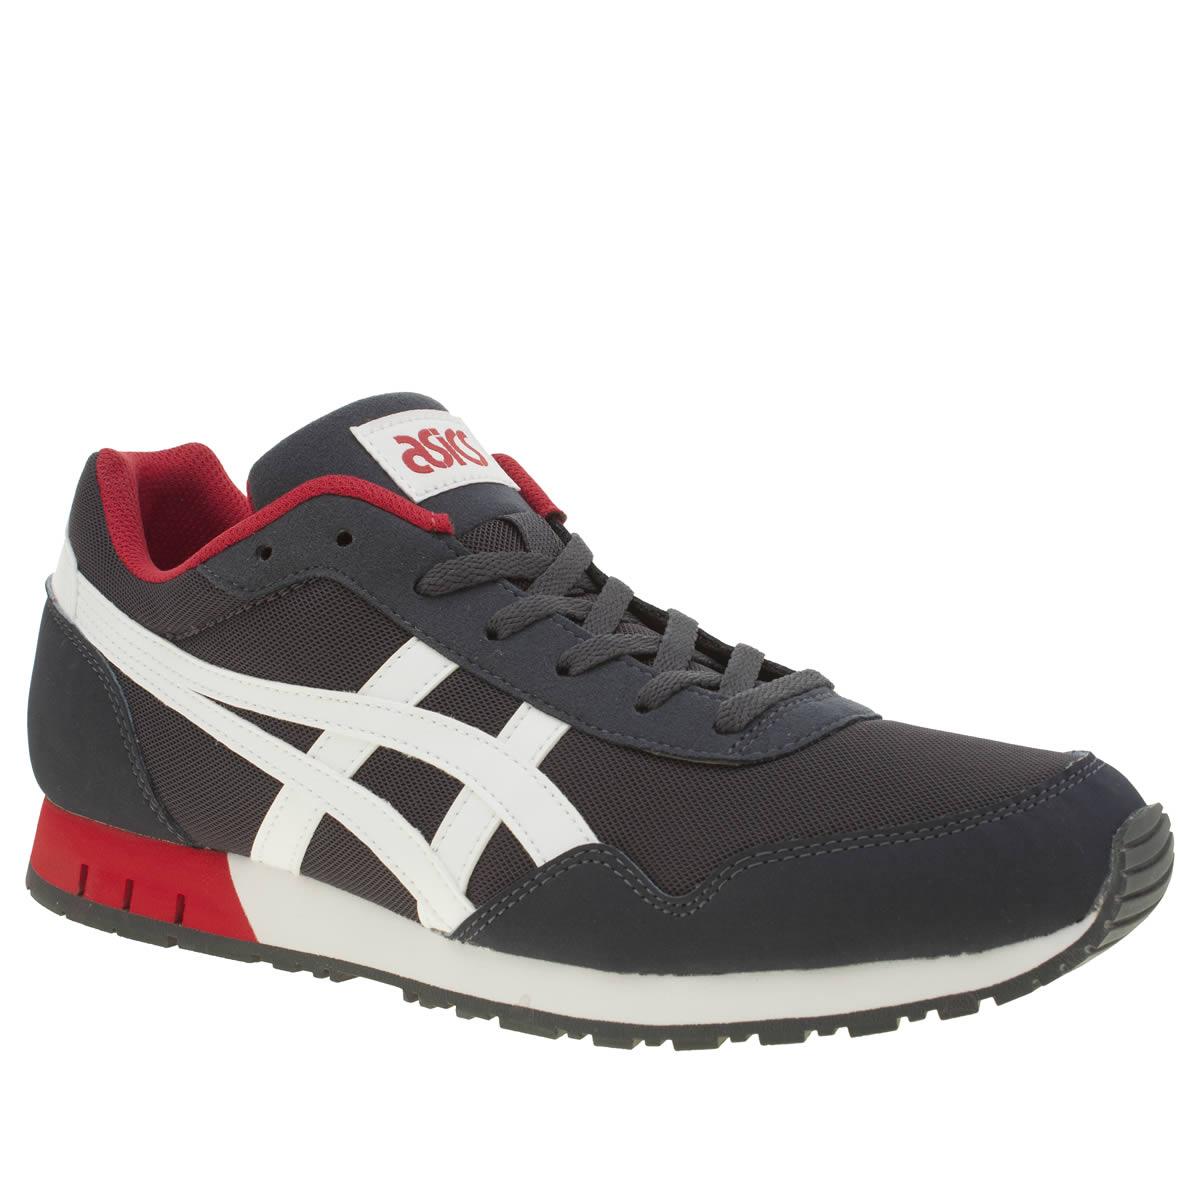 Buy asics retro trainers \u003e Up to OFF65